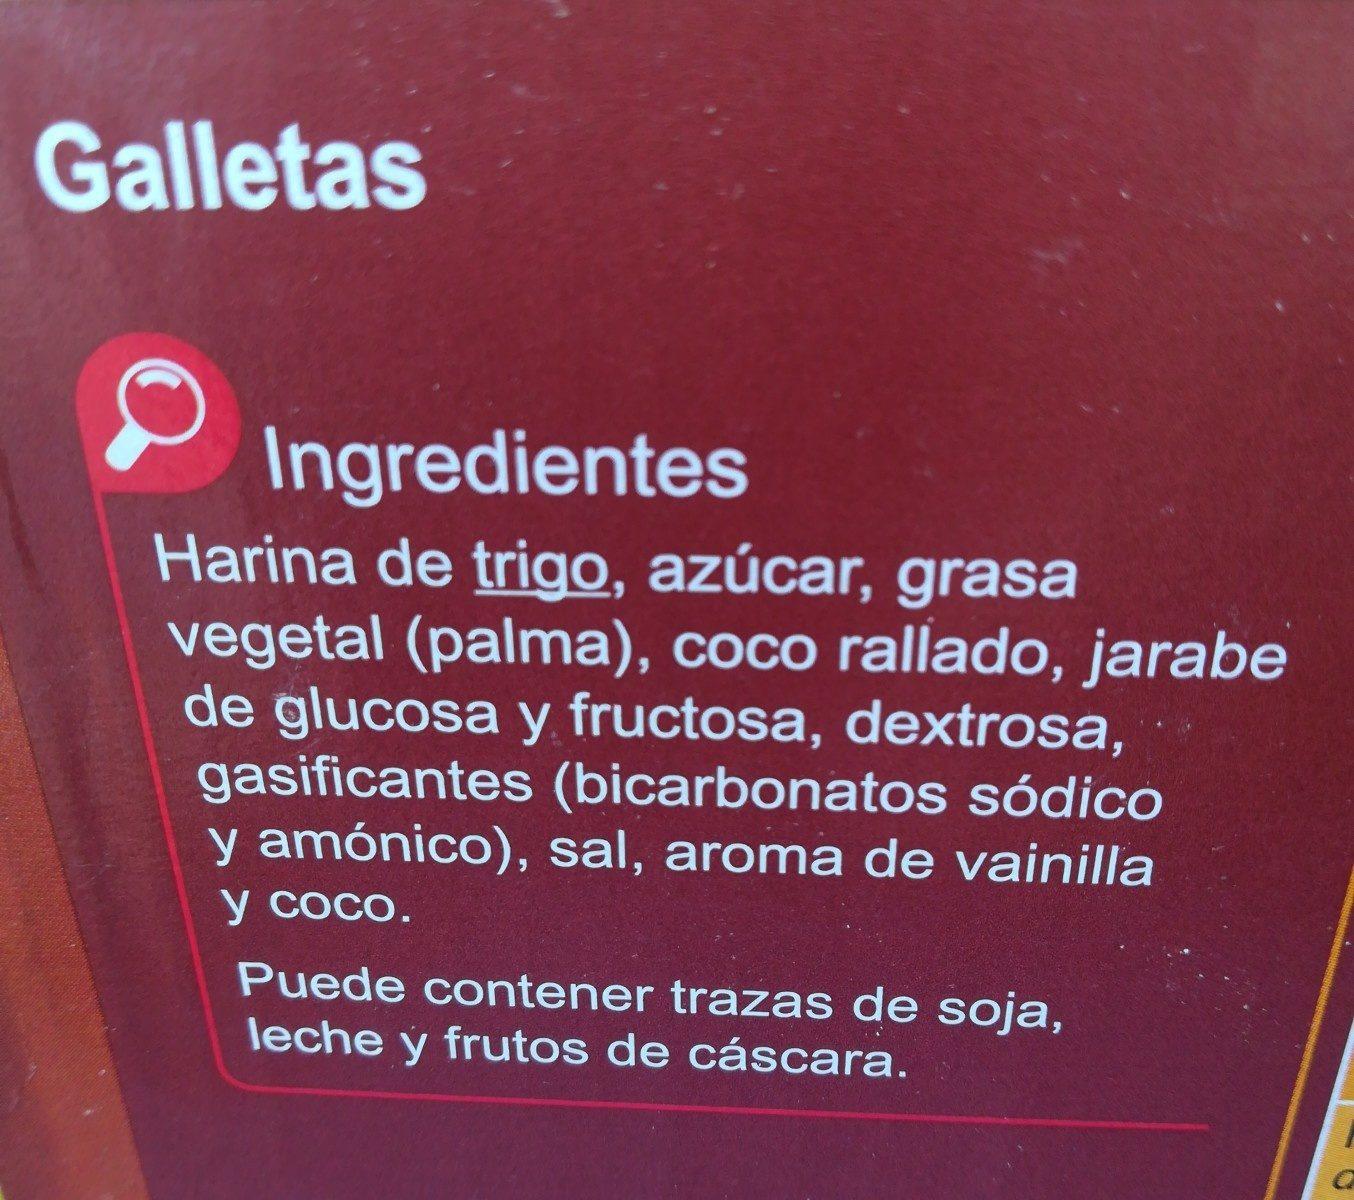 Galleta horneada - Ingrédients - fr